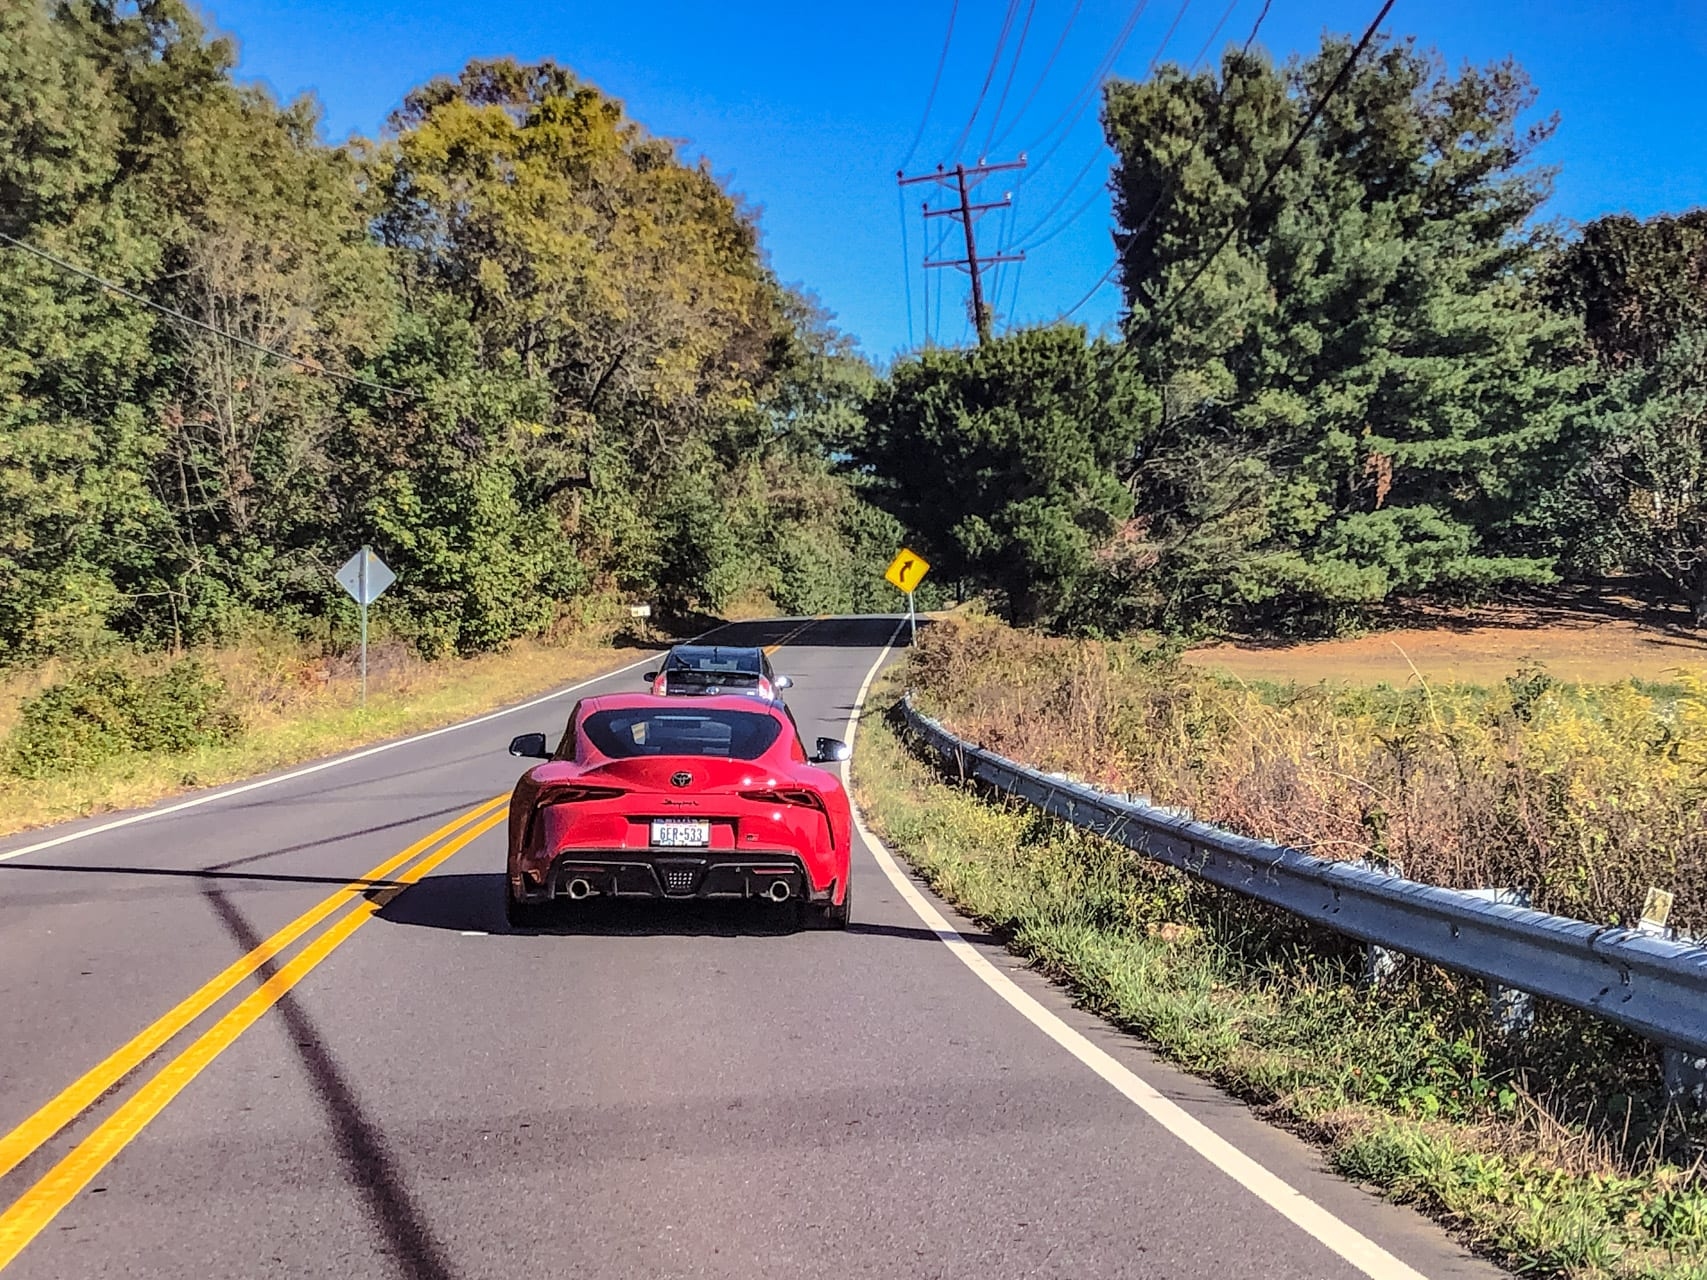 BMW Z4 vs. Toyota Supra